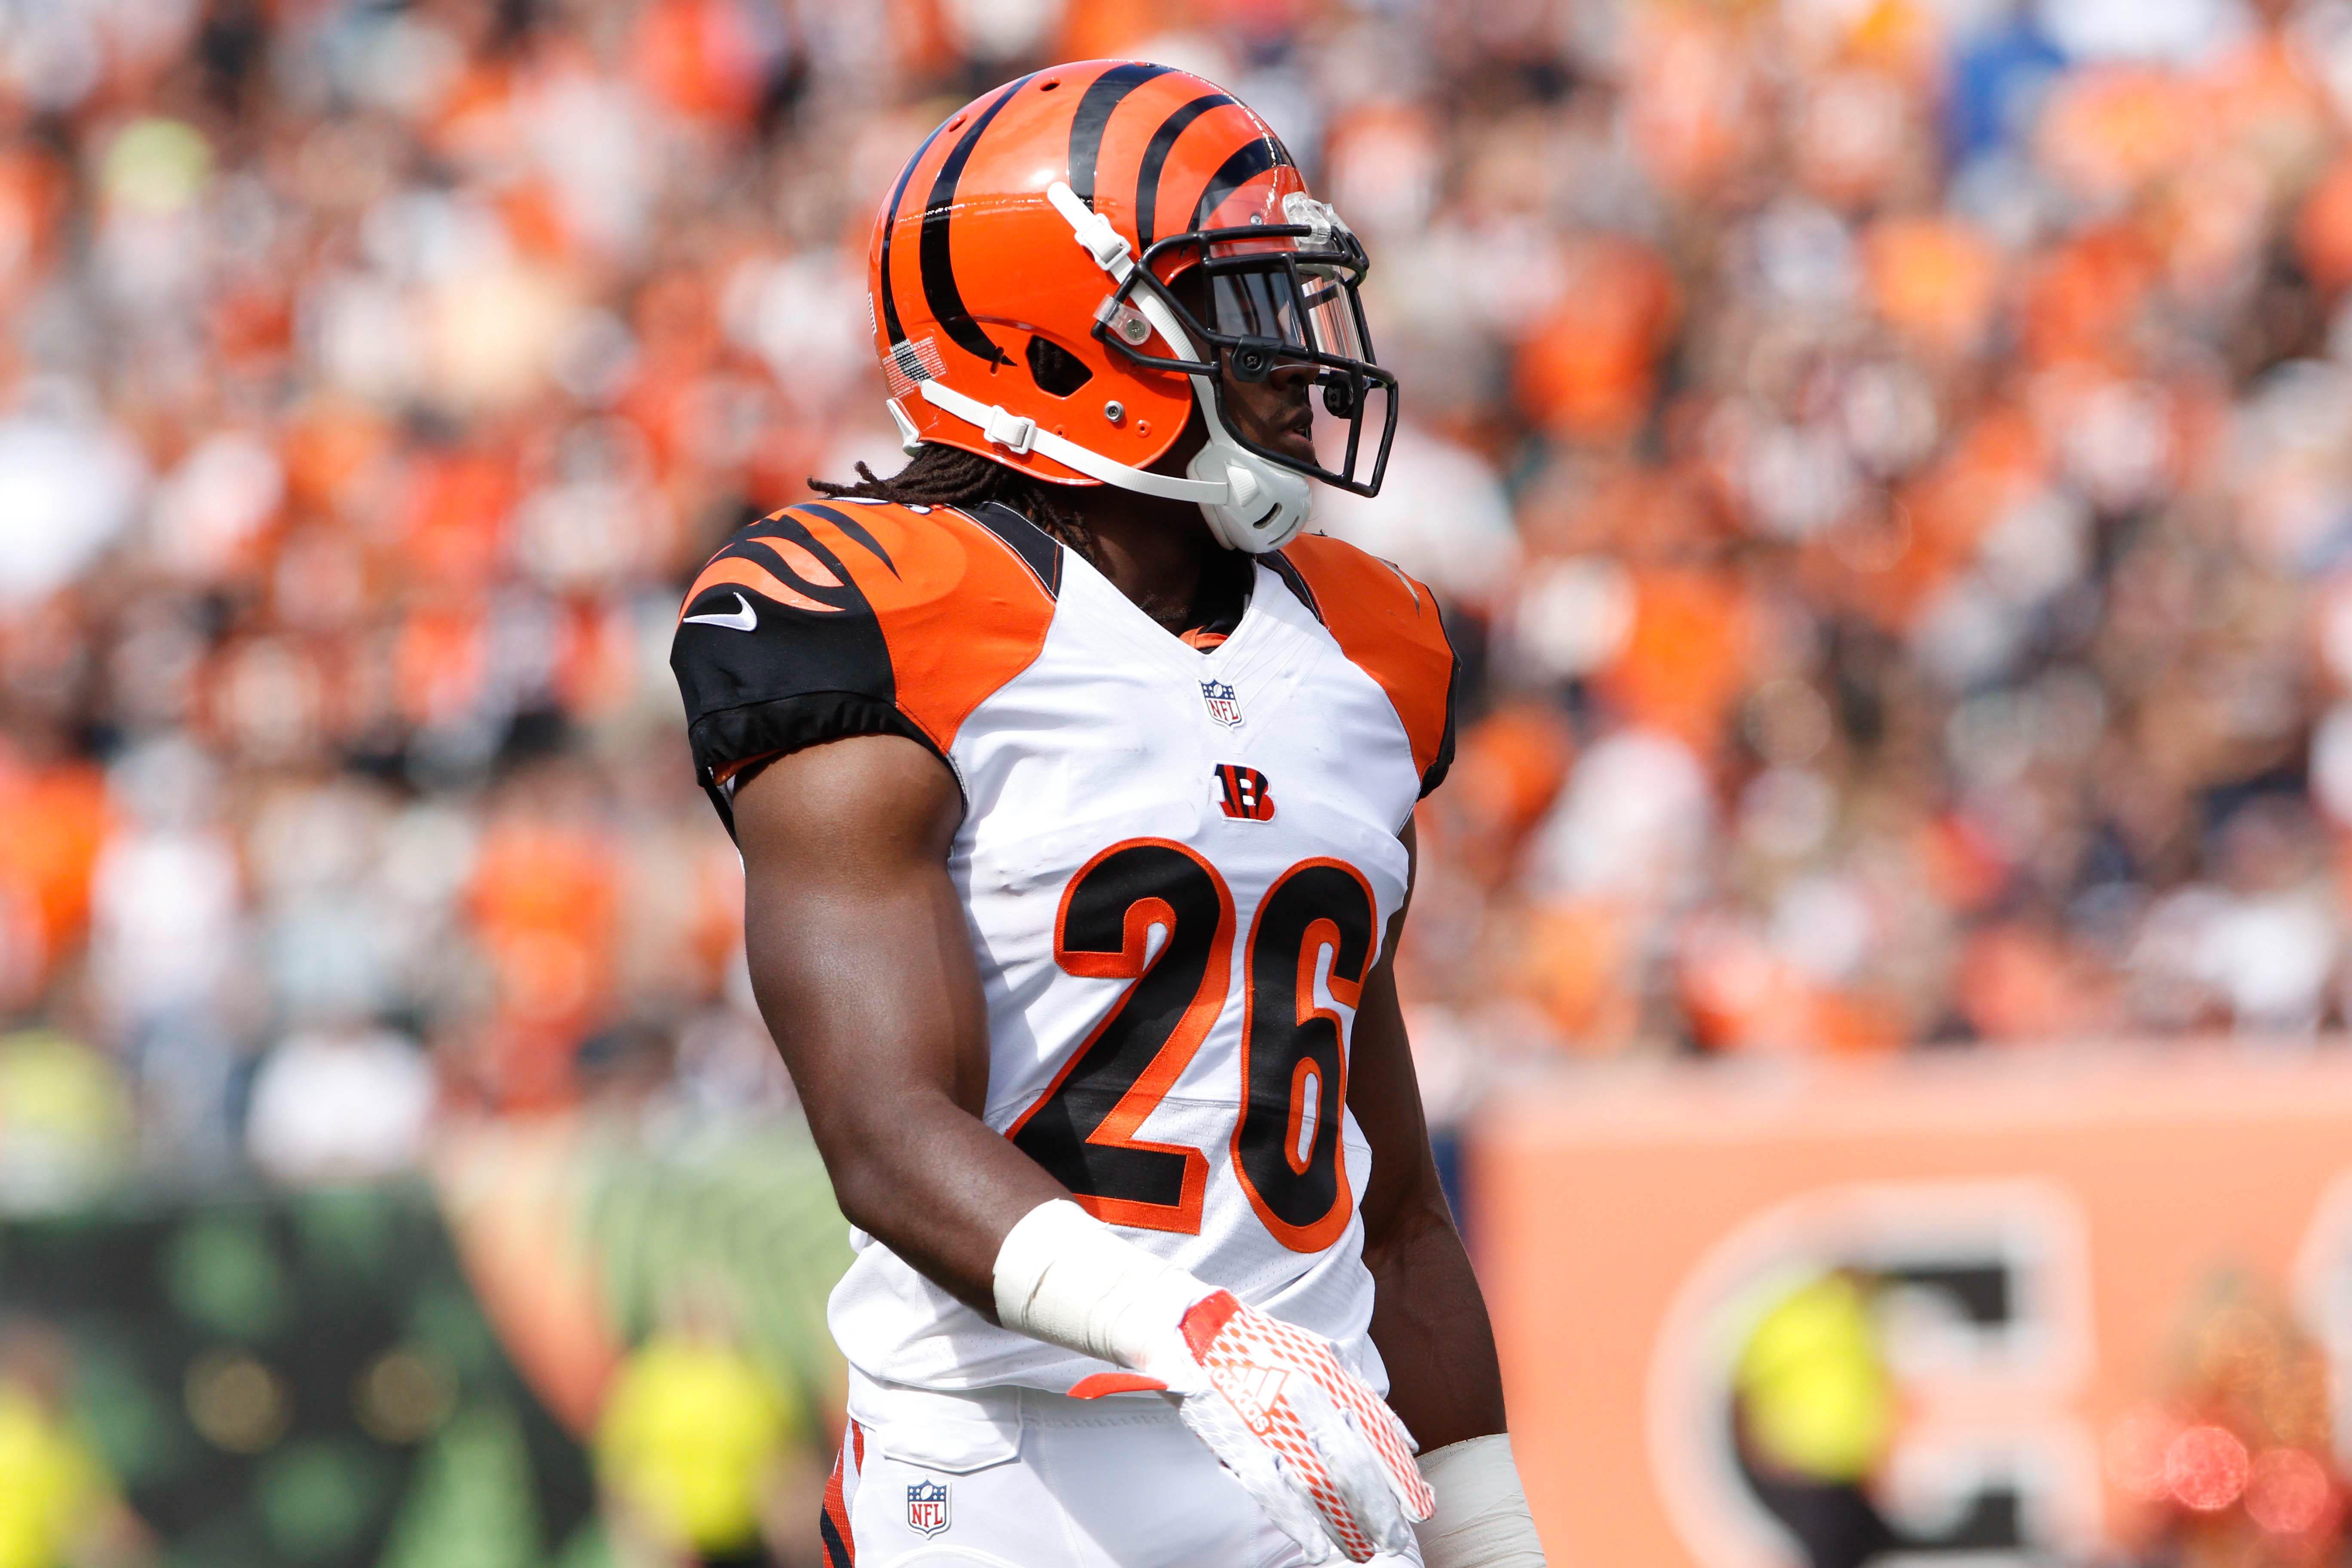 NFL: San Diego Chargers at Cincinnati Bengals